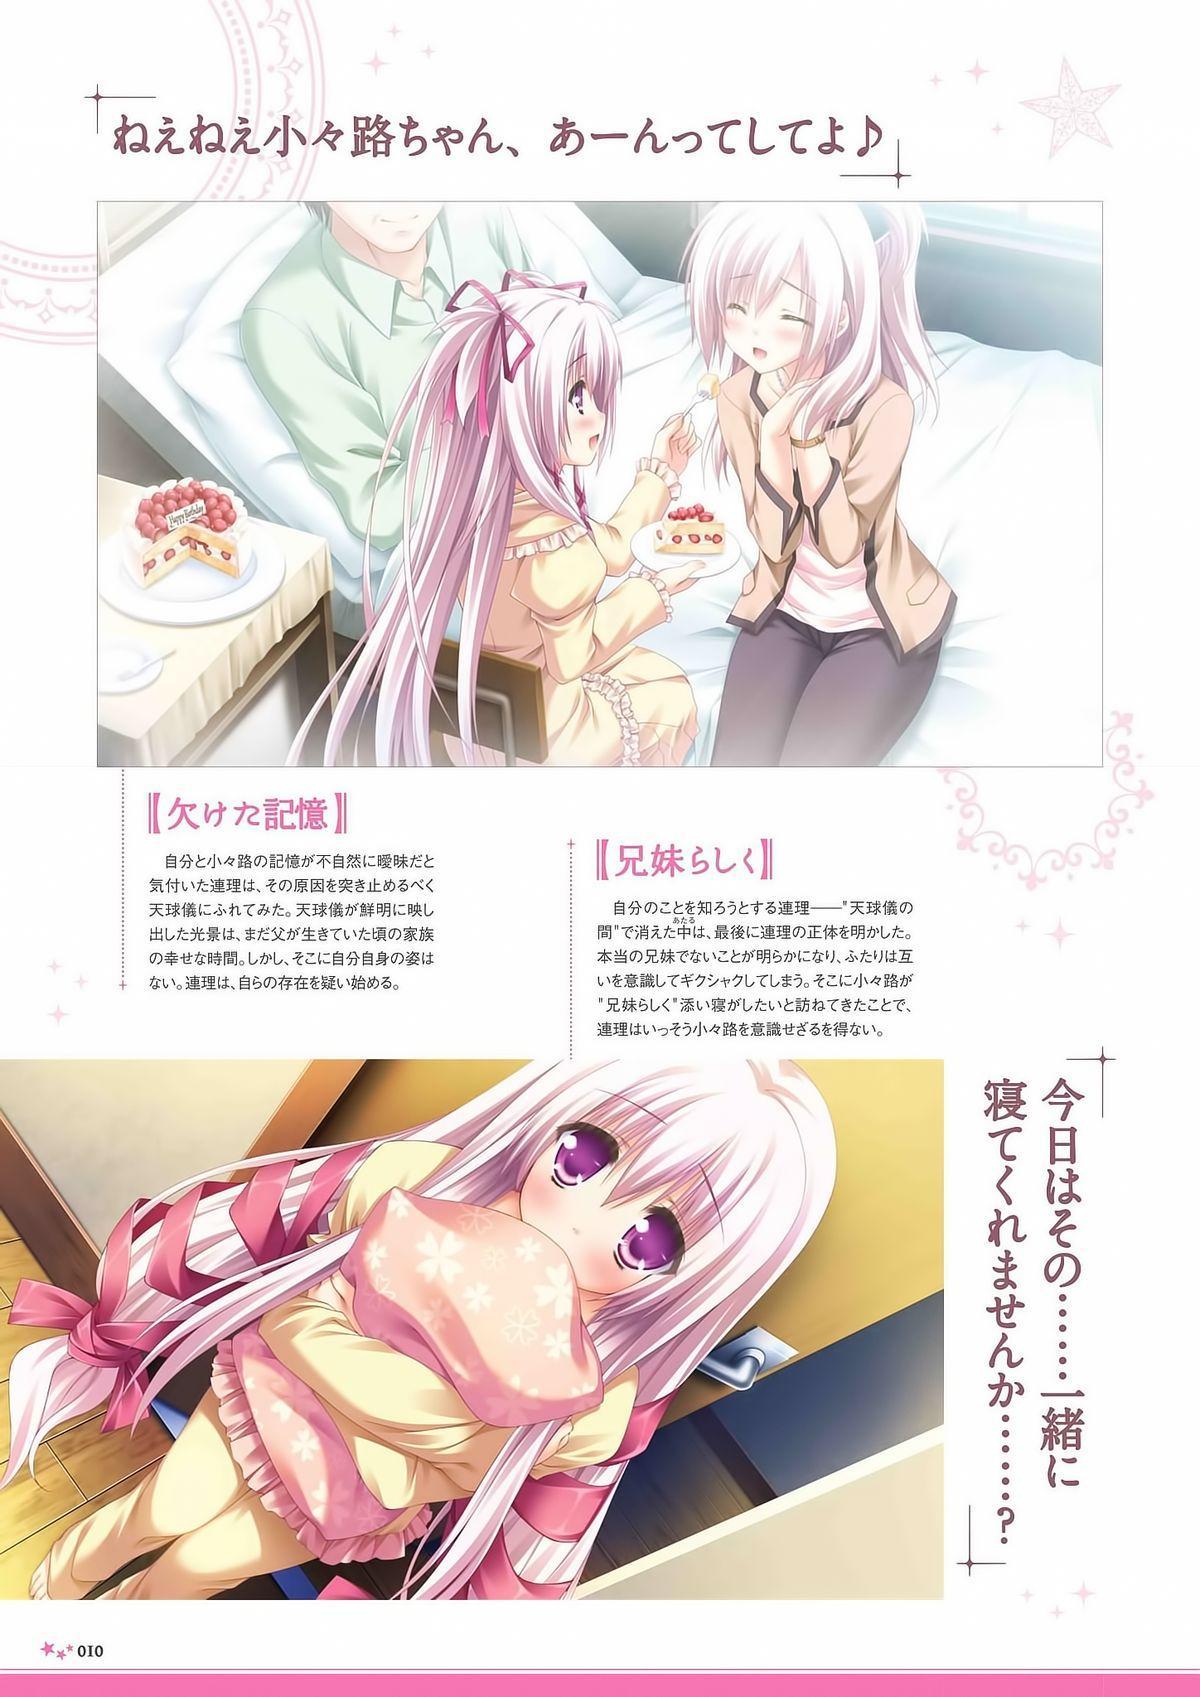 Sekai to Sekai no Mannaka de Visual Fanbook 11